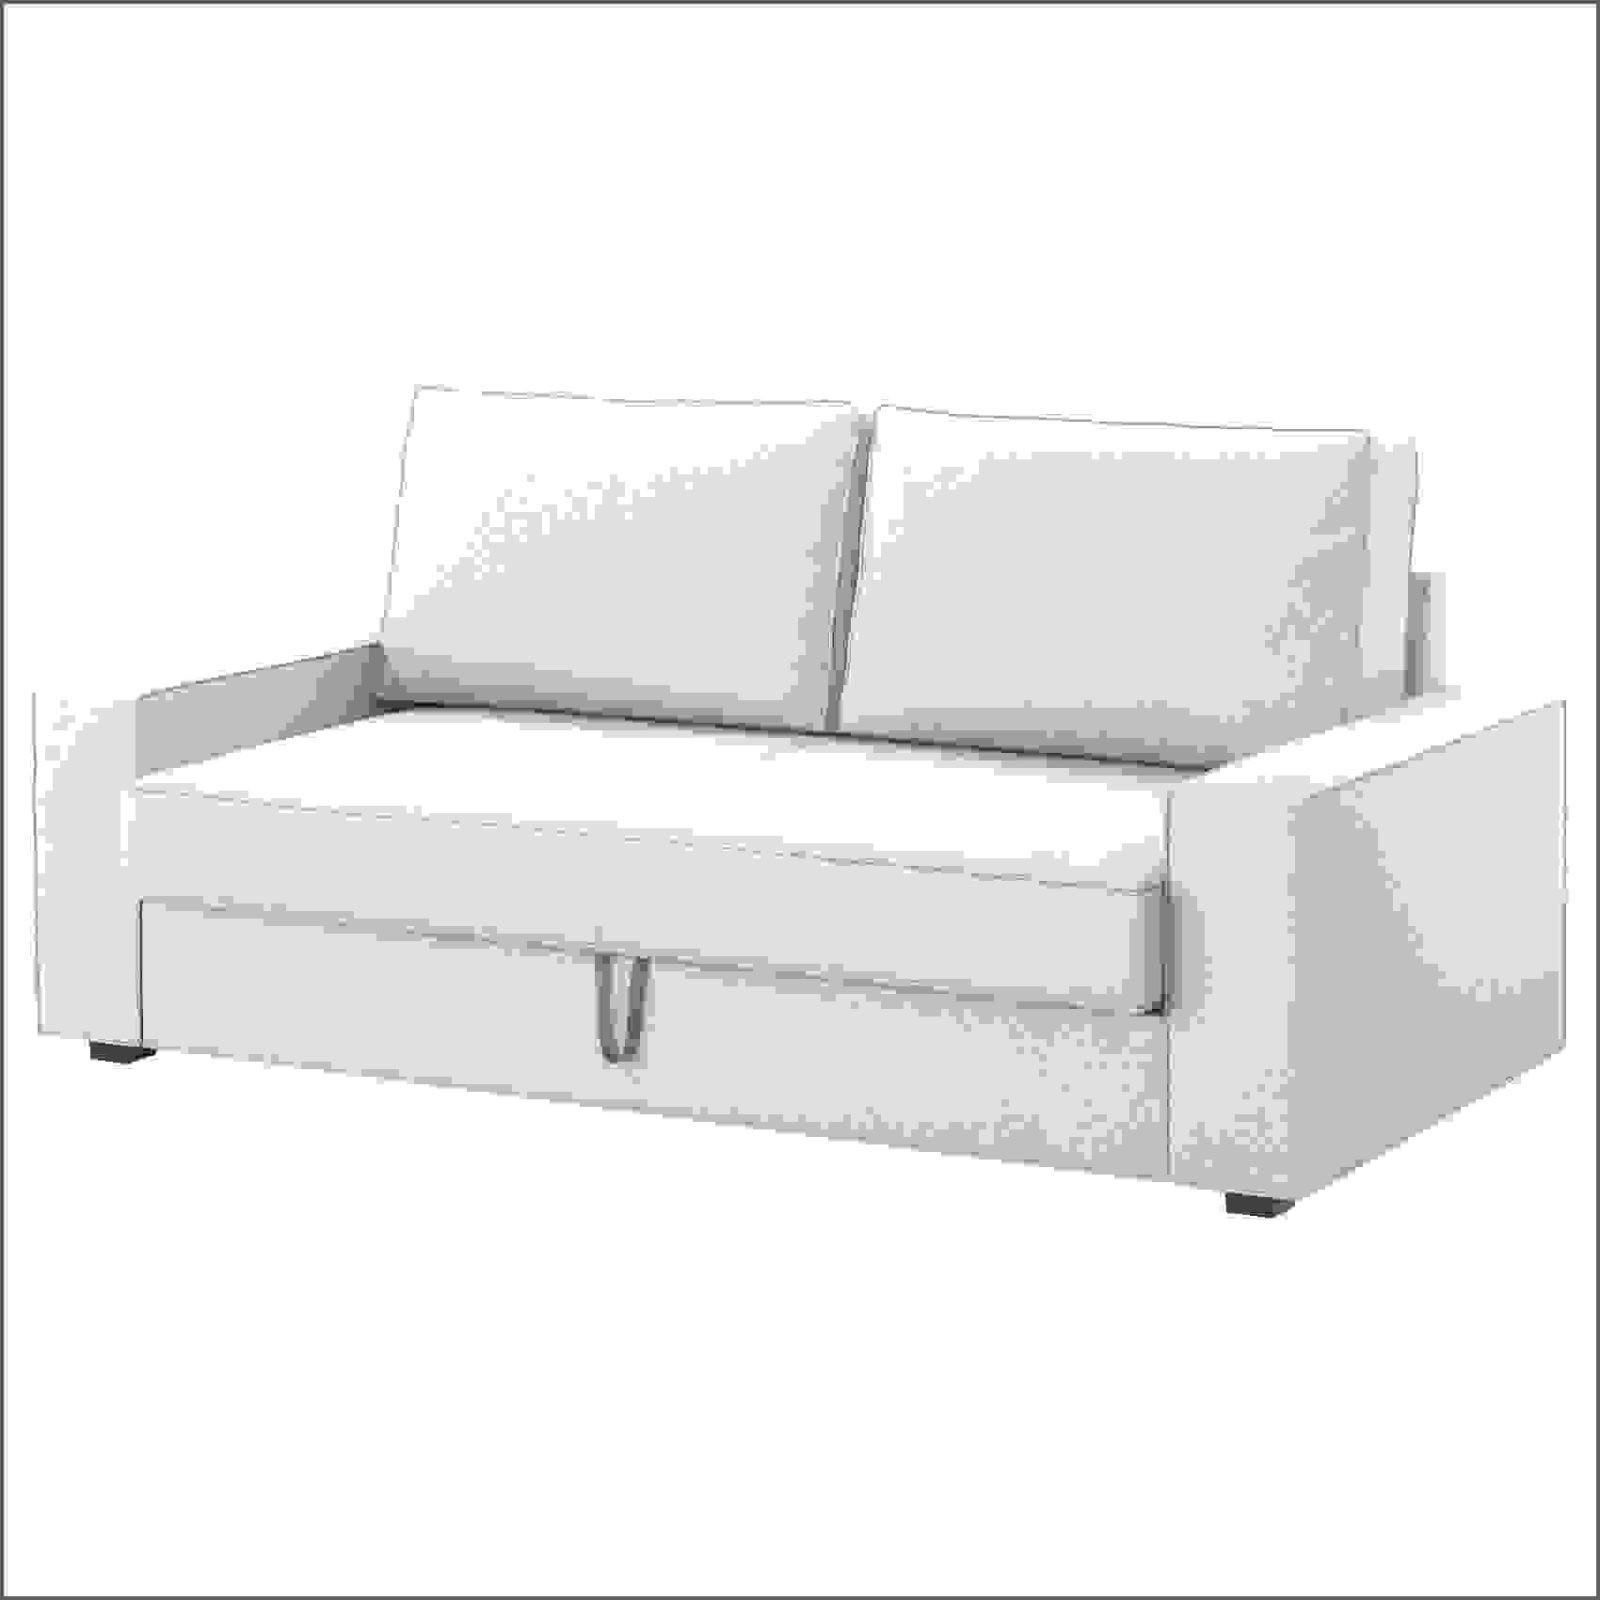 2er bettsofa gunstig jersey sofa slipcover reviews schlafsofa 150 breit frisch askeby grau ikea